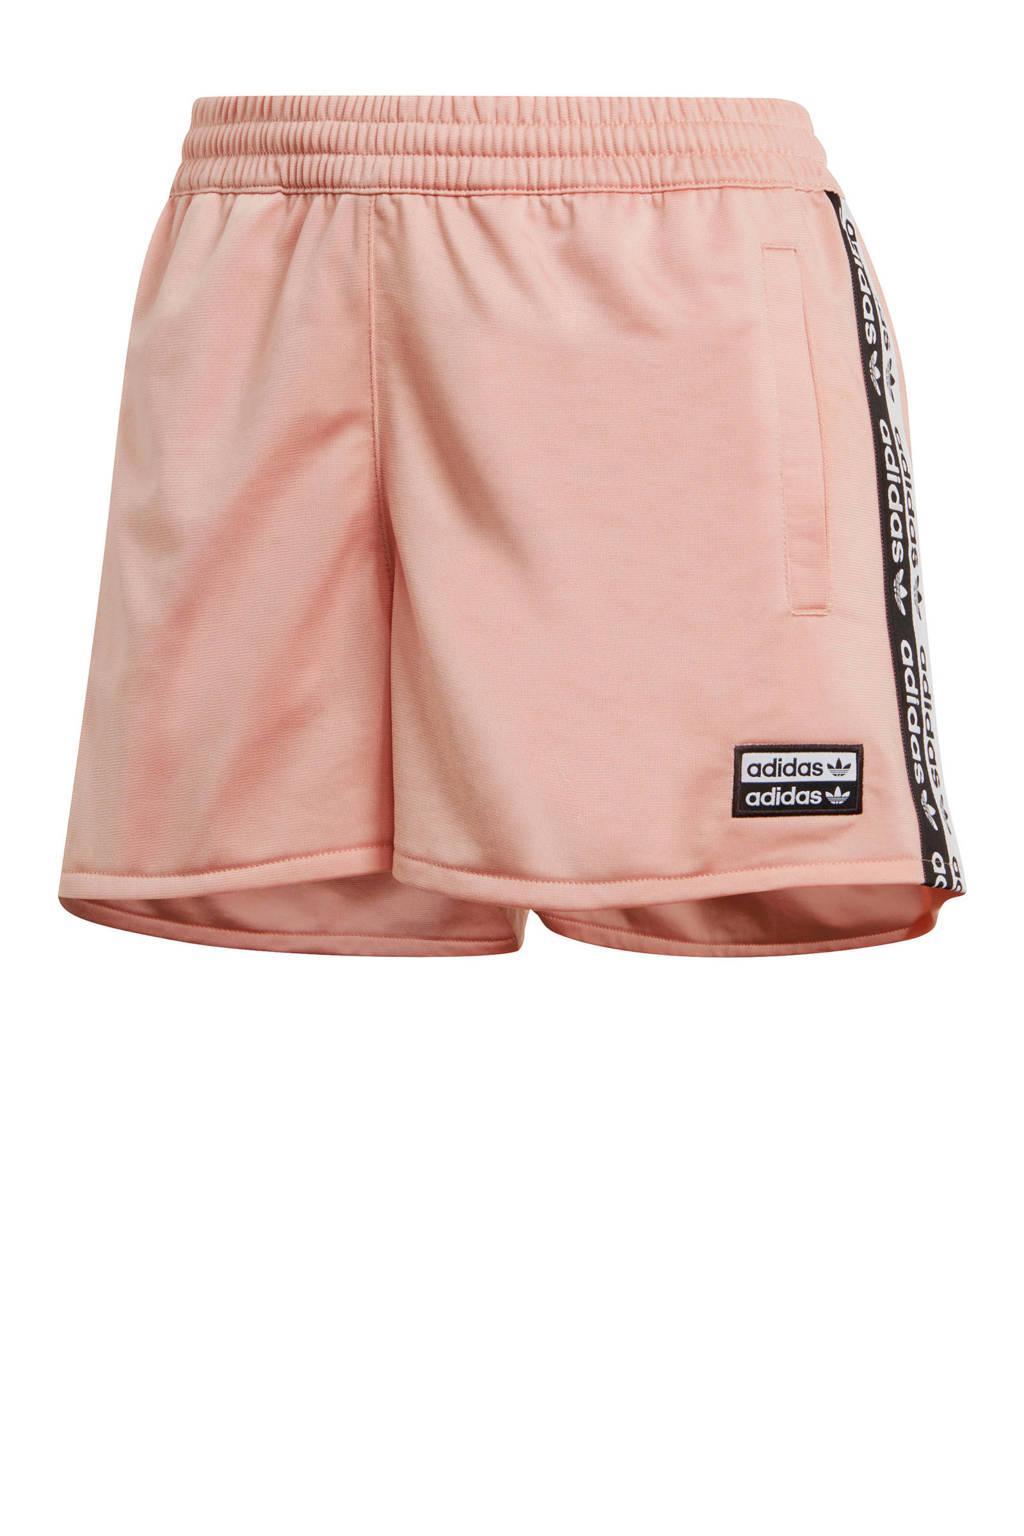 adidas originals sweatshort roze, Roze